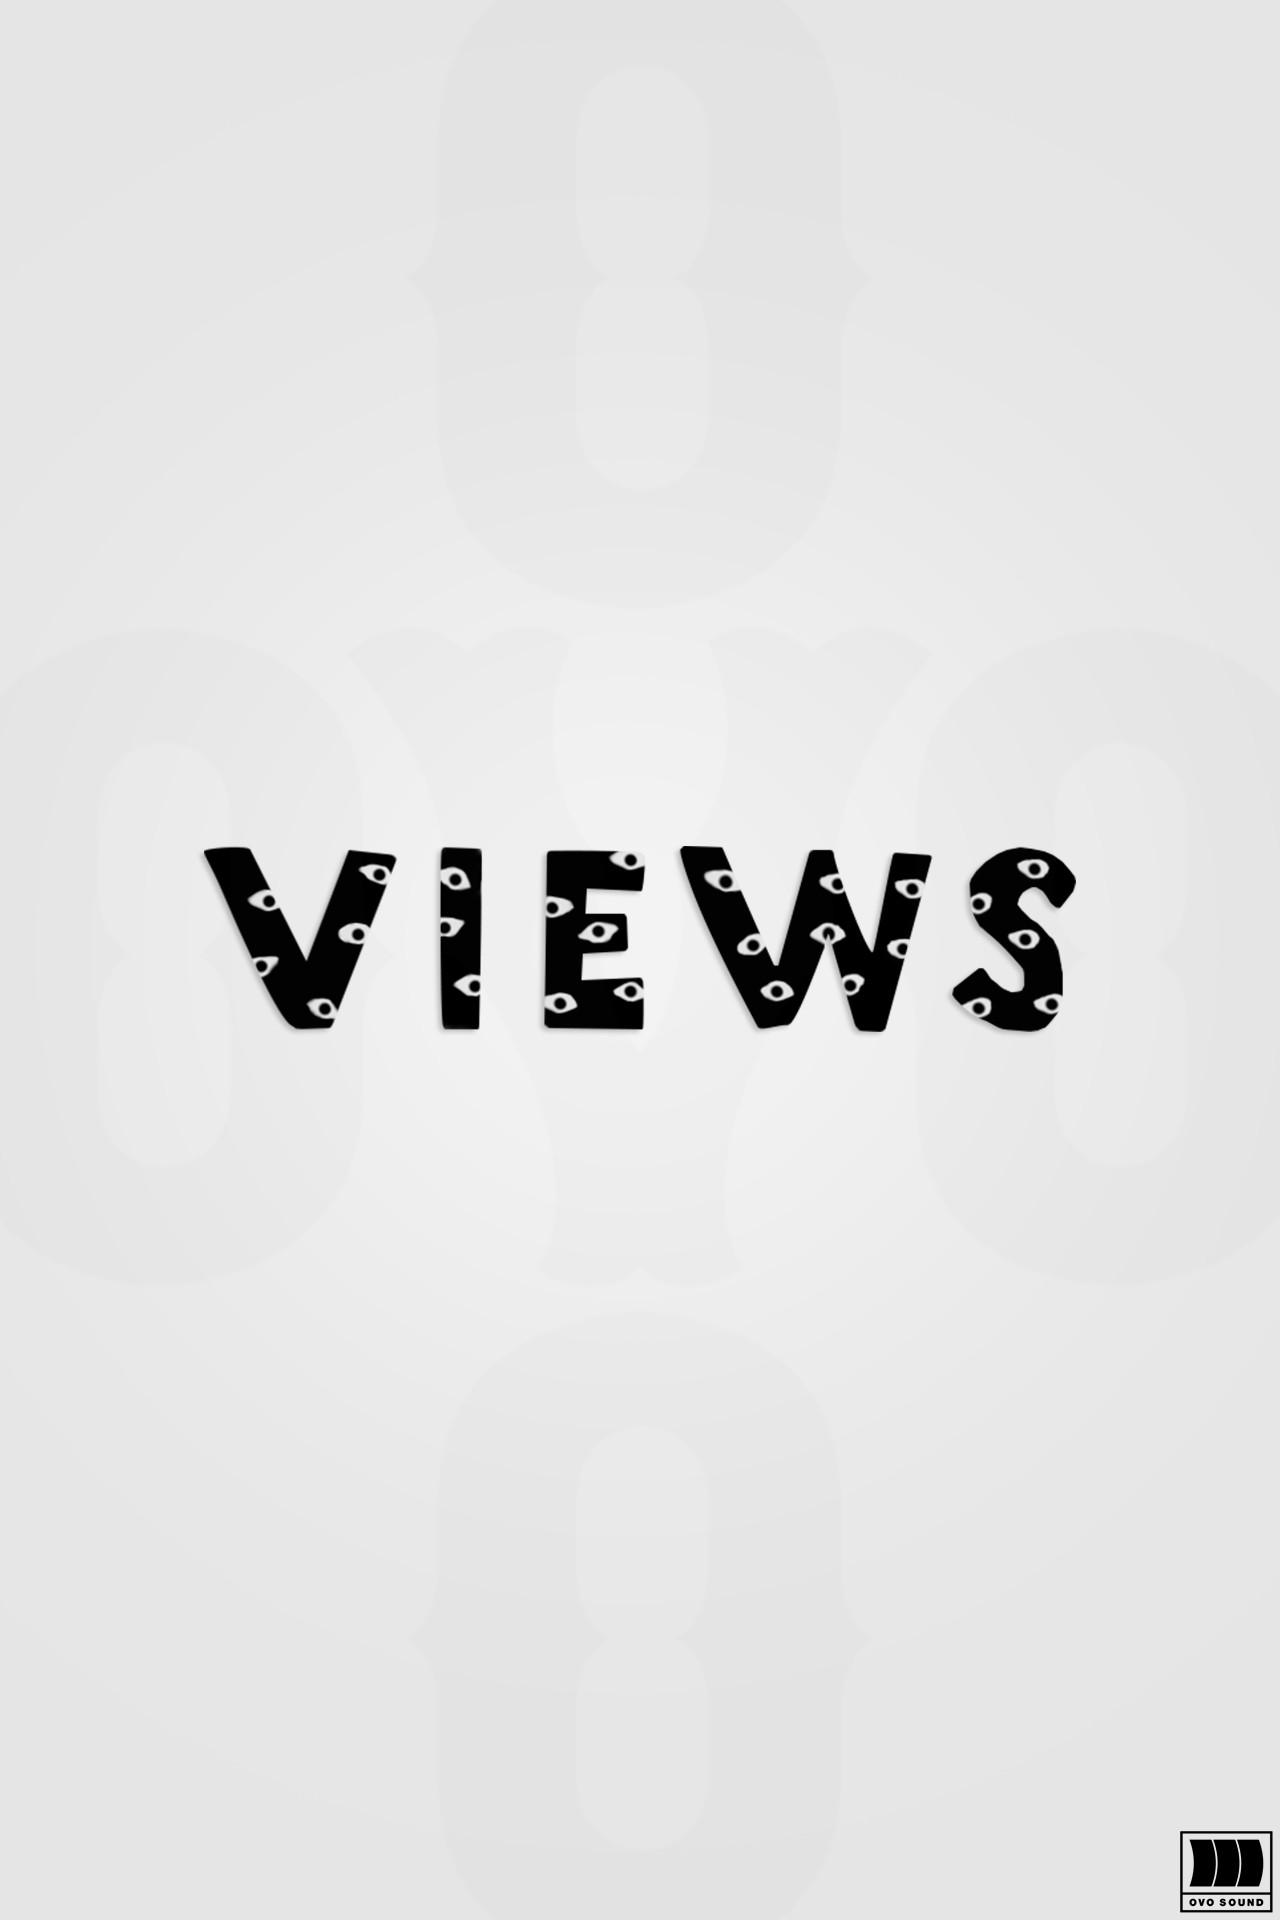 views from the 6 6ix 6 god 6 man 416 toronto toronto drizzy drake ovo ovoxo